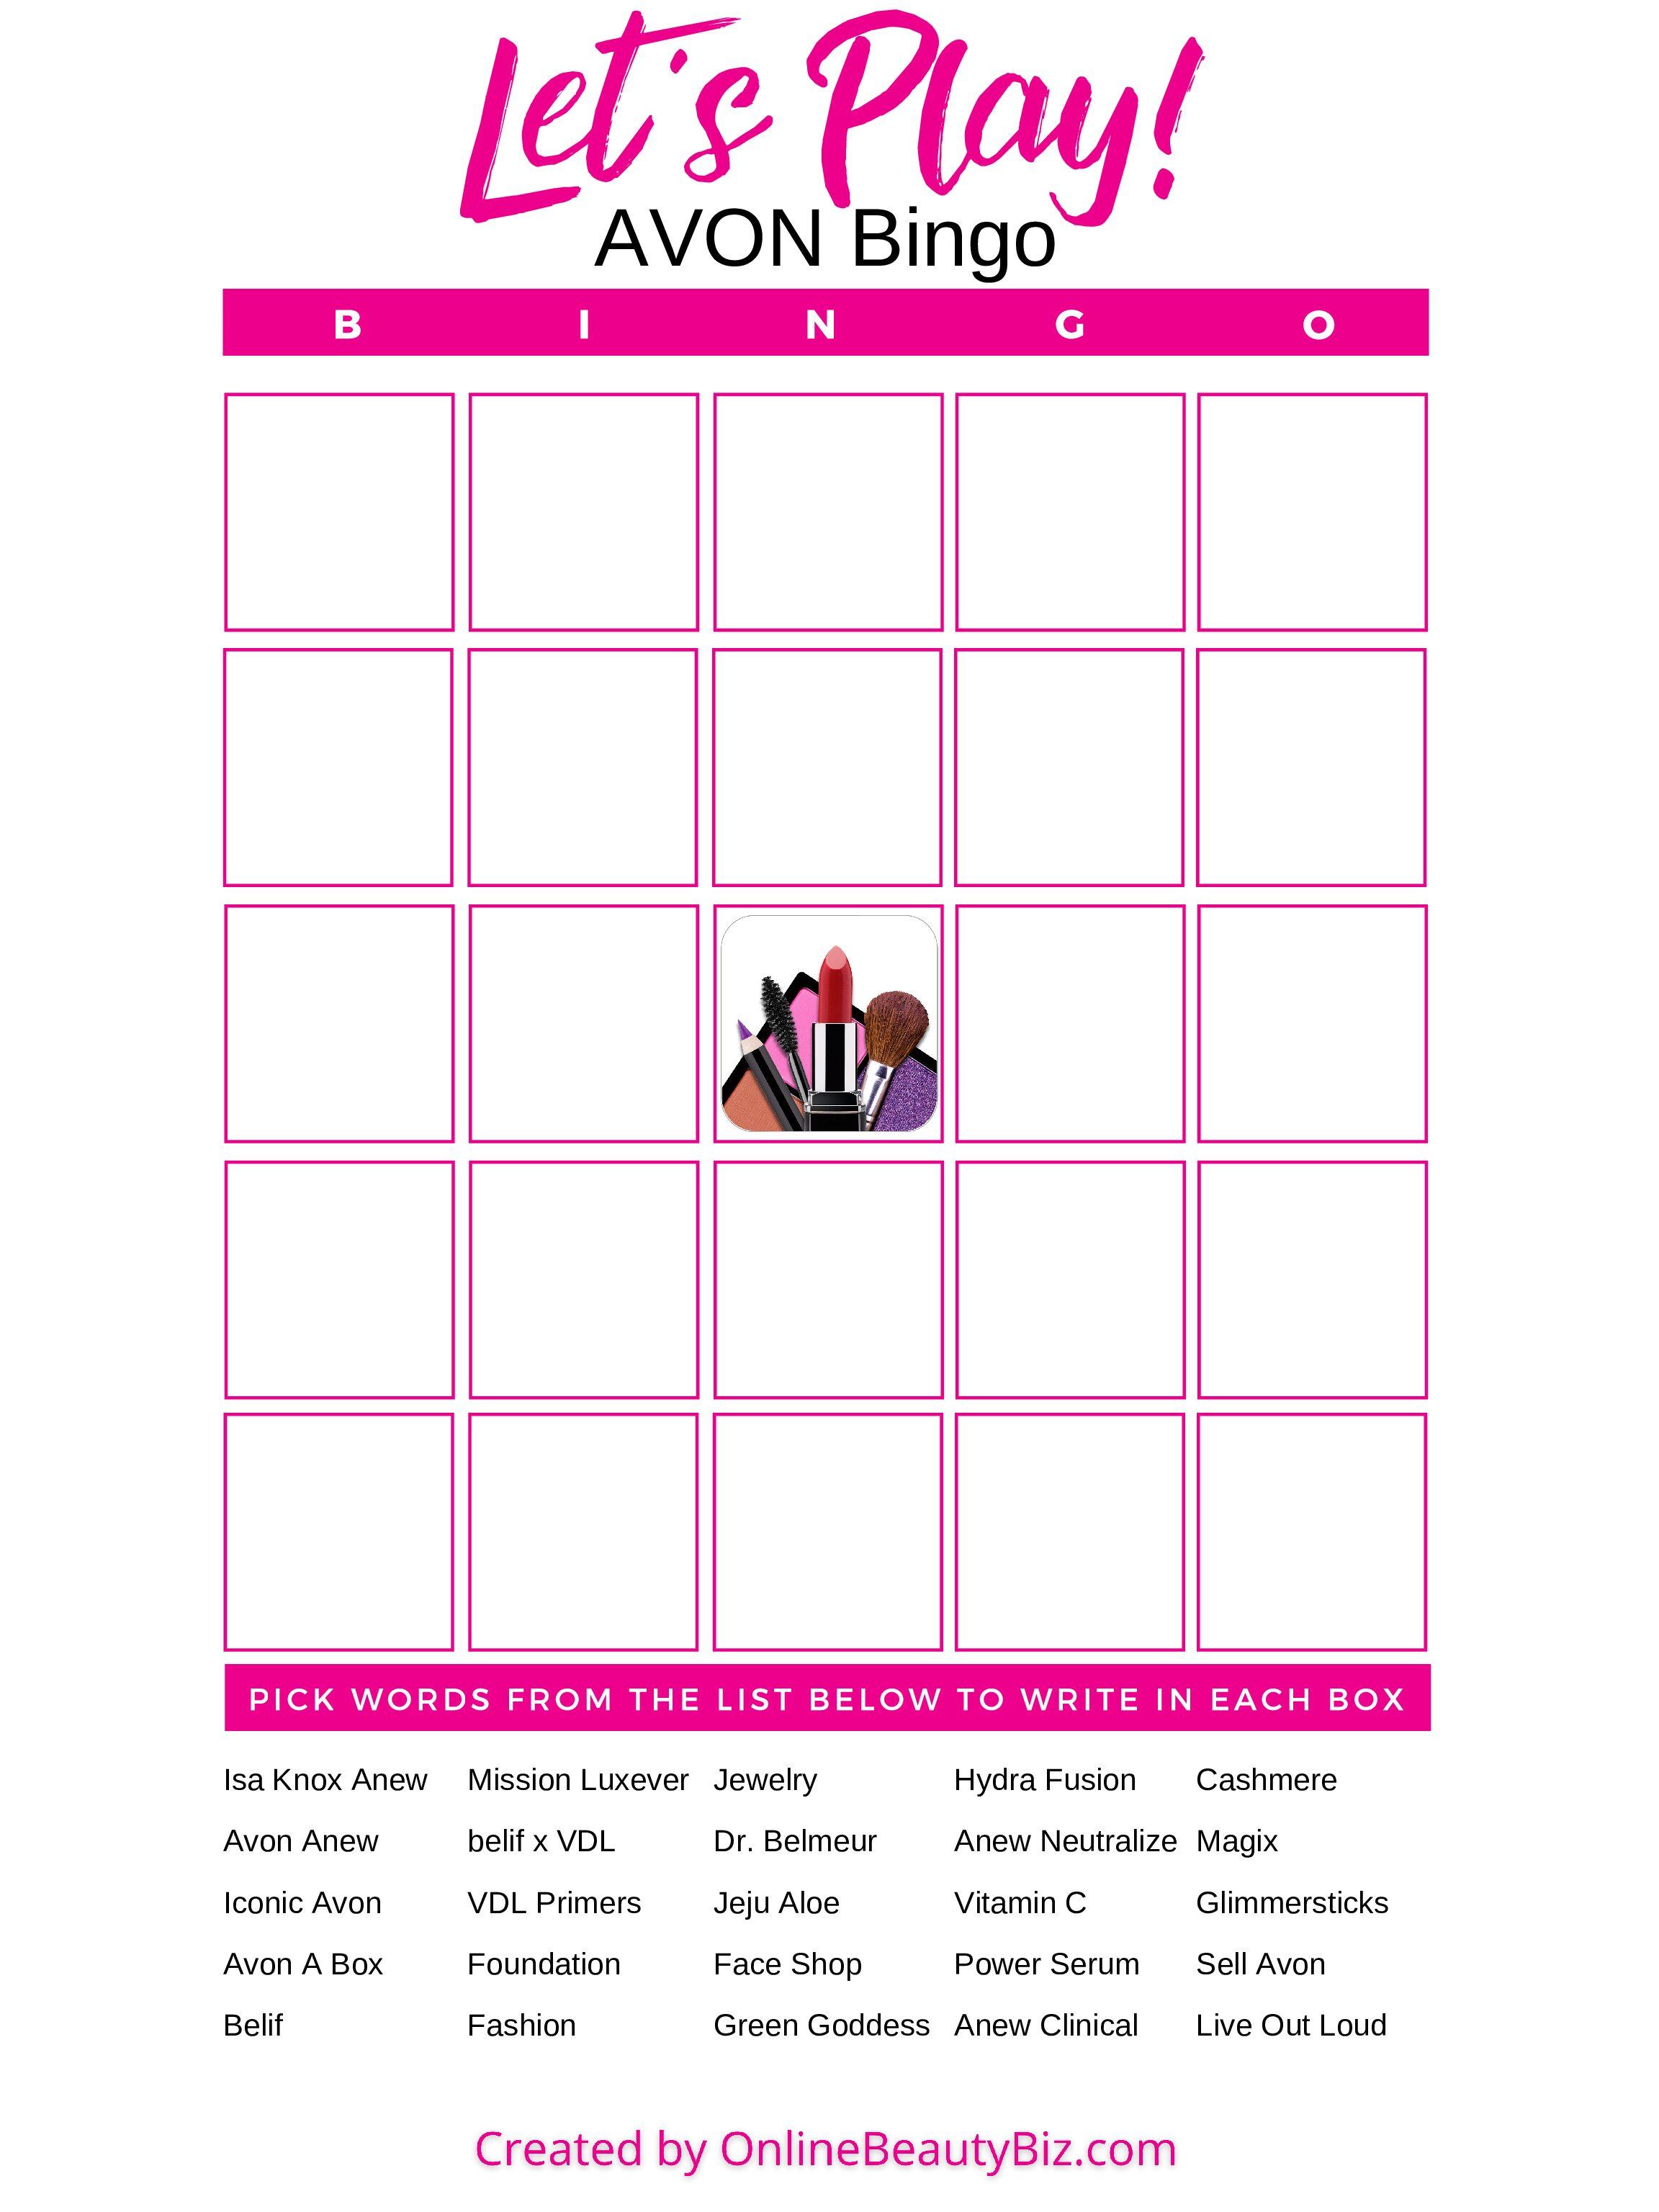 Avon-Bingo-Template-OnlineBeautyBiz